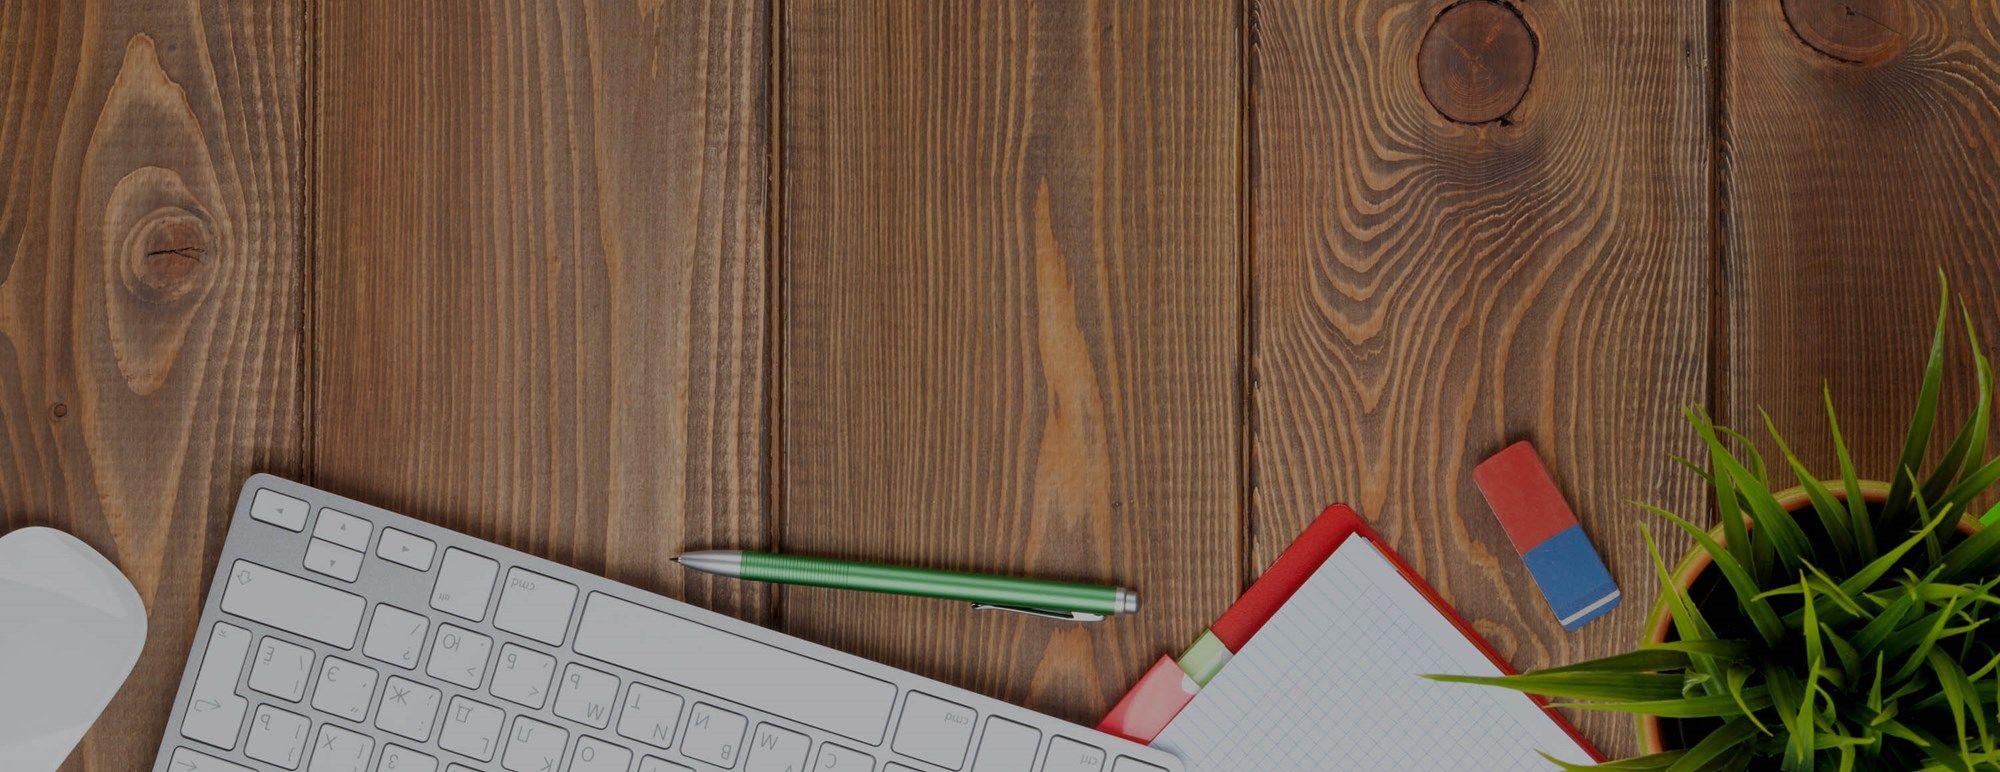 Web Design & Development Blog - CasaSoft Malta Europe